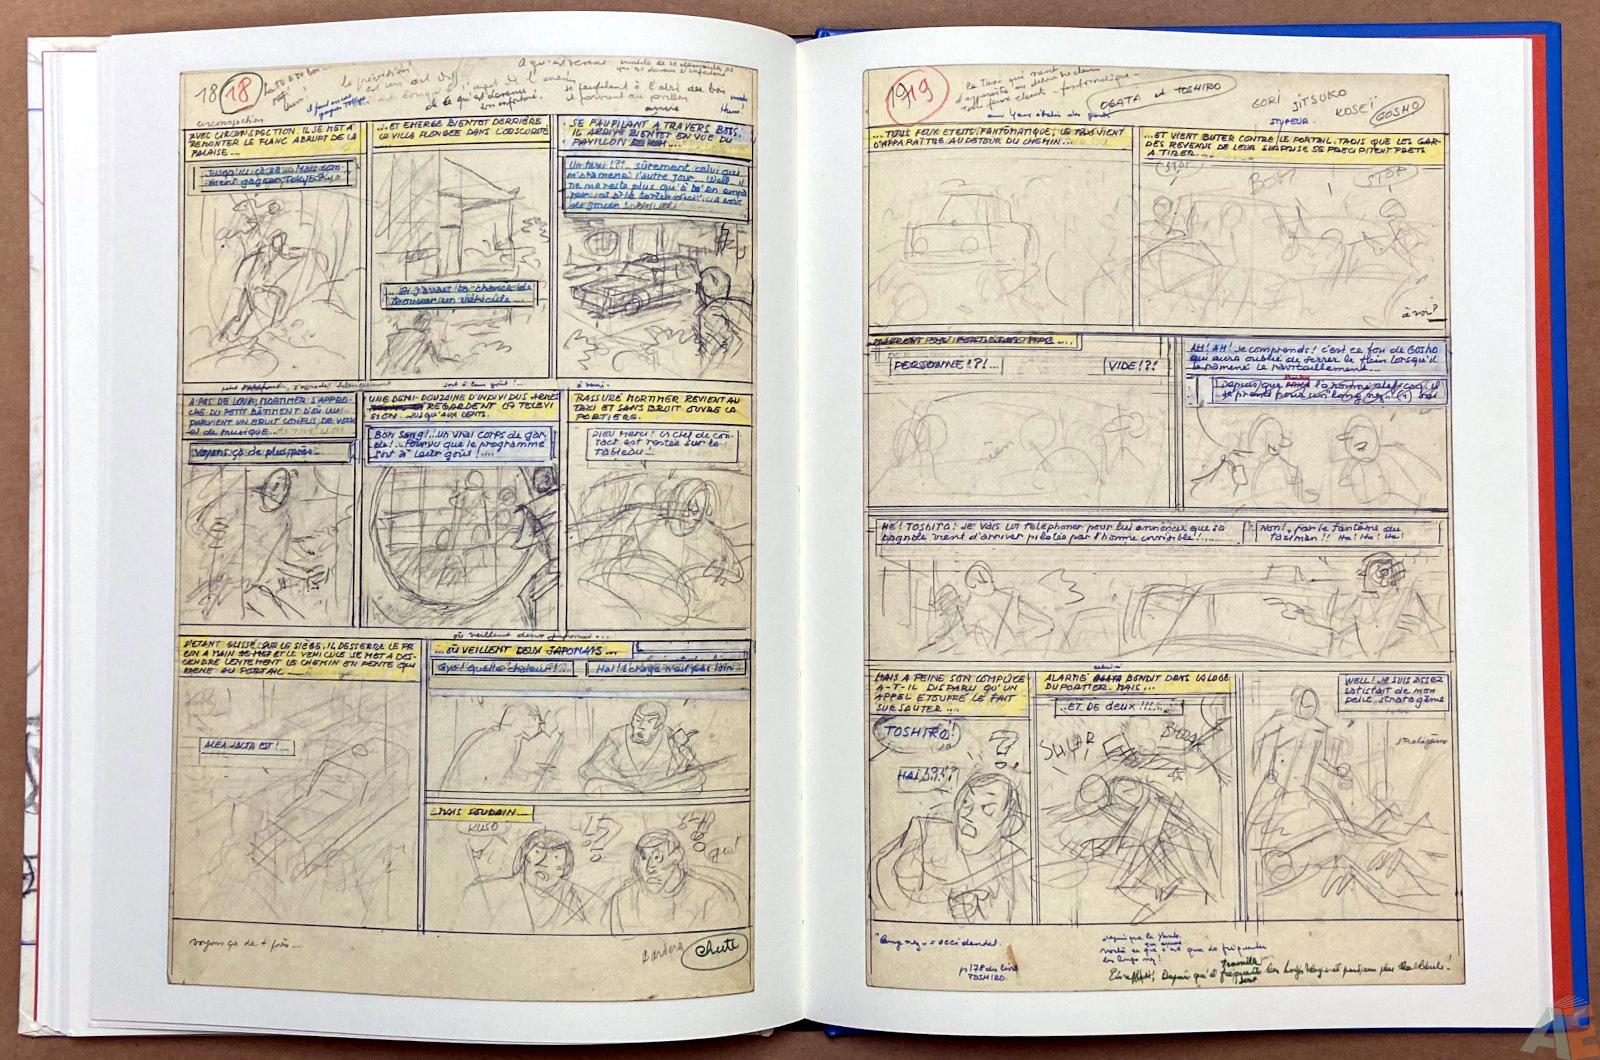 Les 3 Formules Du Professeur Sato Decoupage Original interior 7